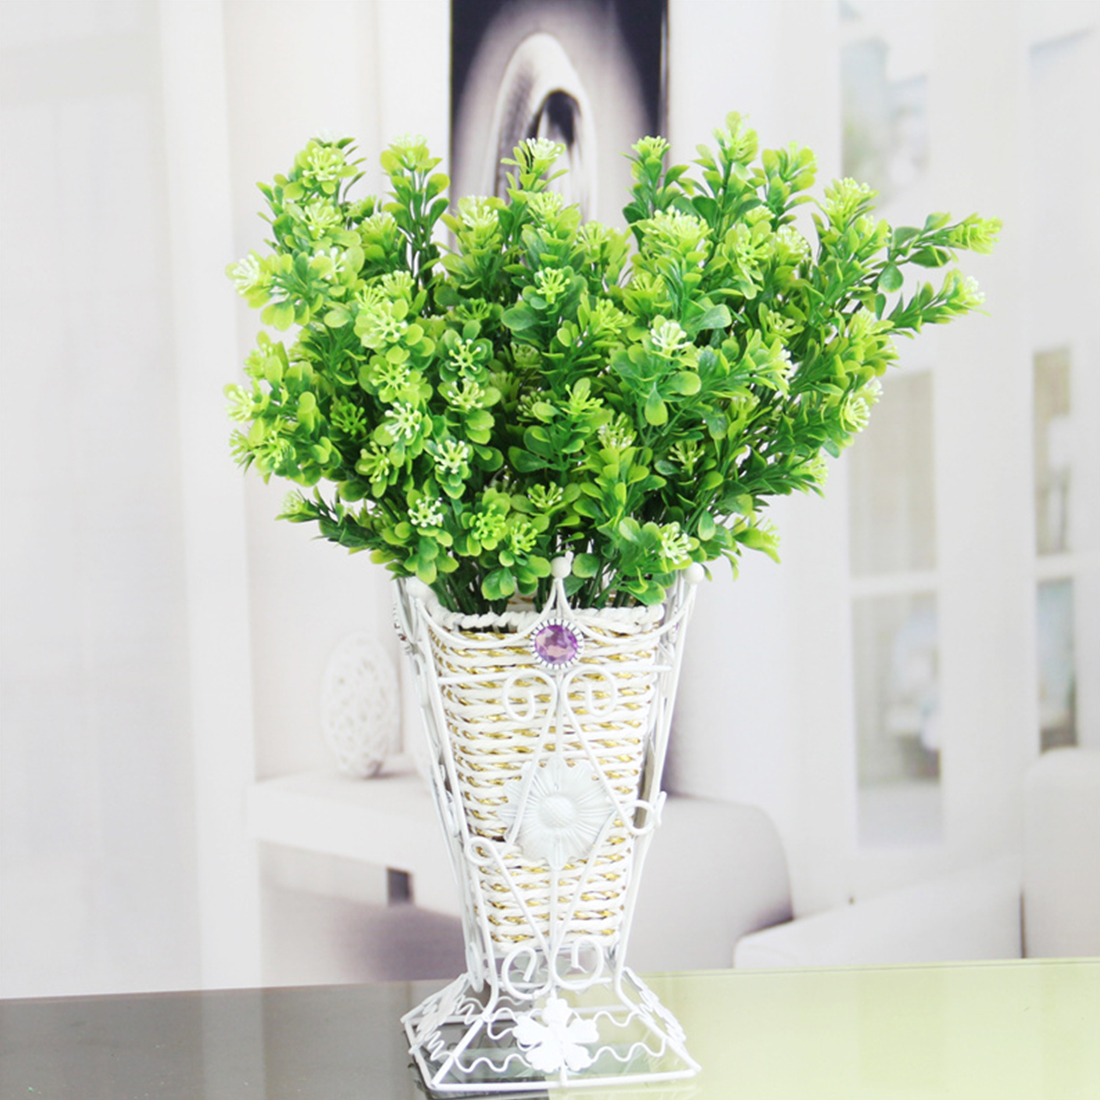 1PC Bouquet Green Artificial Plant Fake Milan Grass Bonsai Decoration Leaf Corner Lawn Decoration Wedding-Decoration